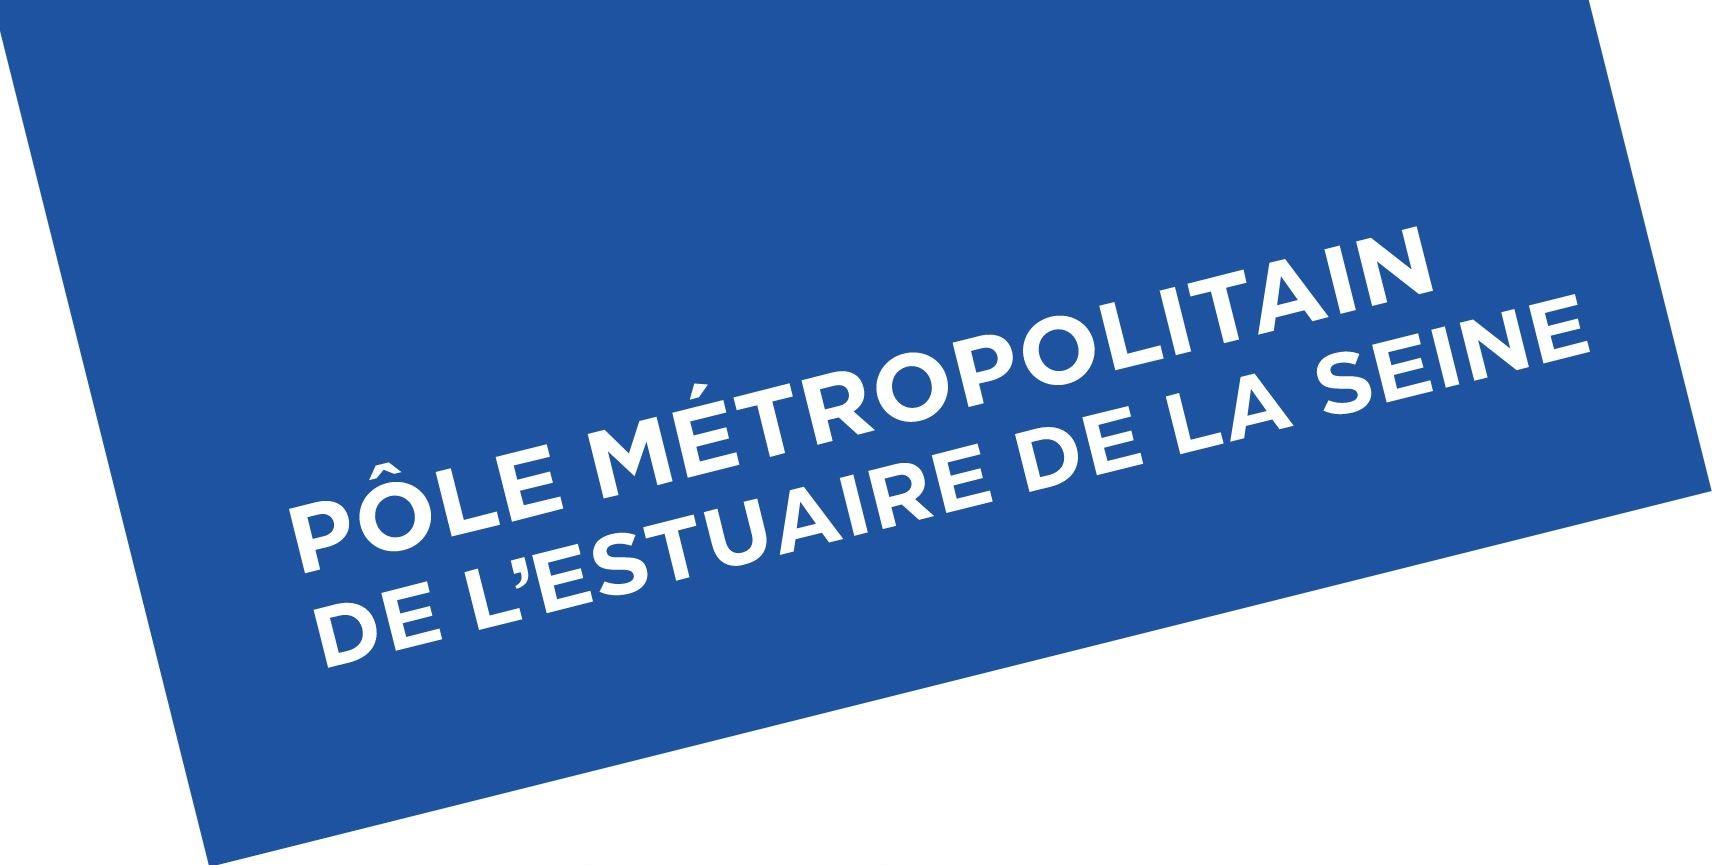 Pole Metropolitain Estuaire De La Seine